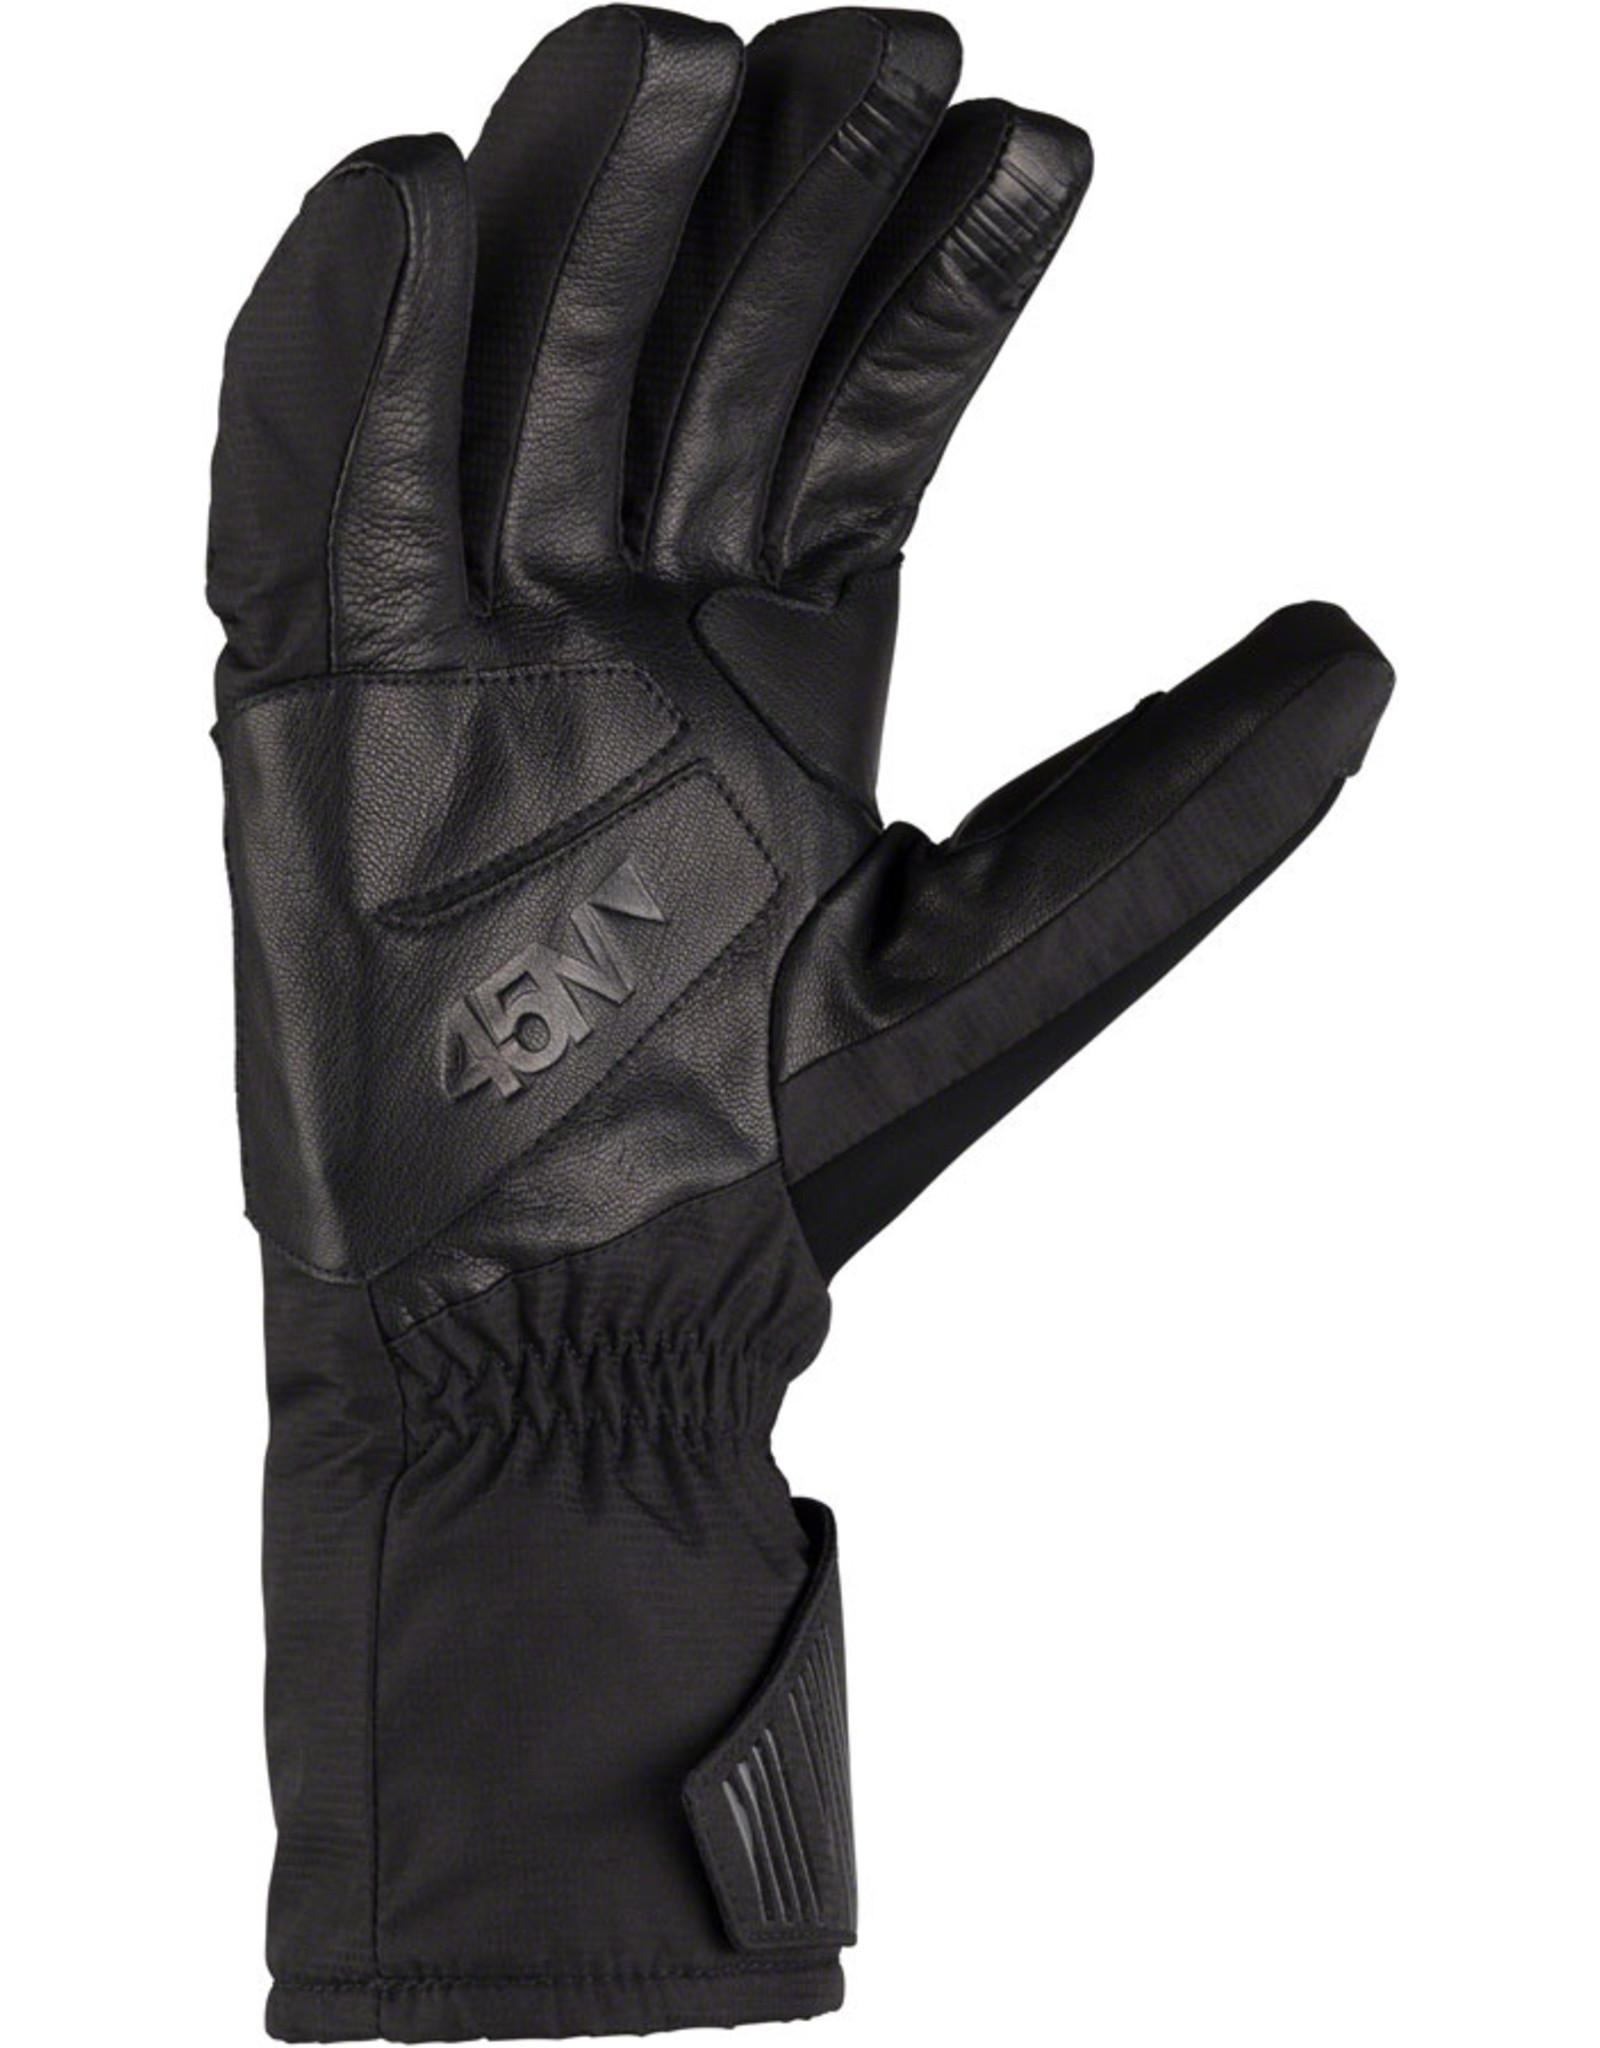 45NRTH 45NRTH Sturmfist 5 Finger Glove: Black XL (10)